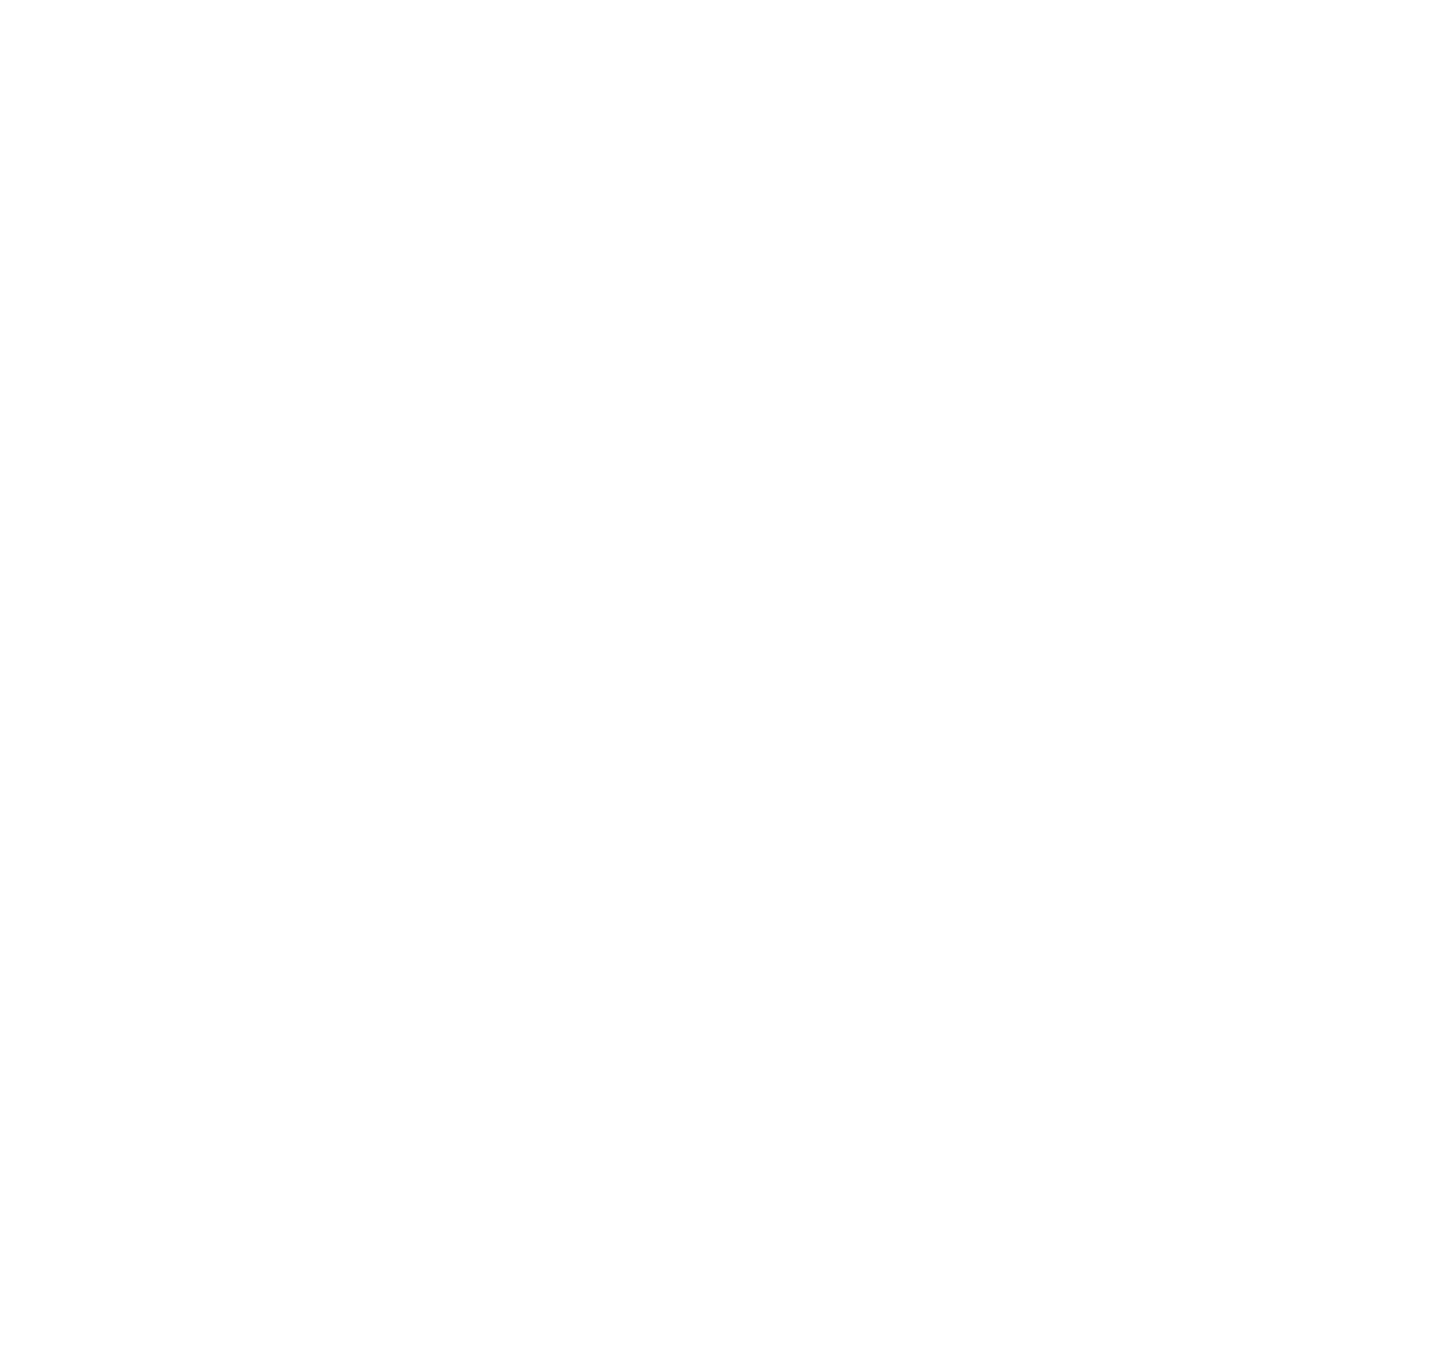 CBT-LINKs